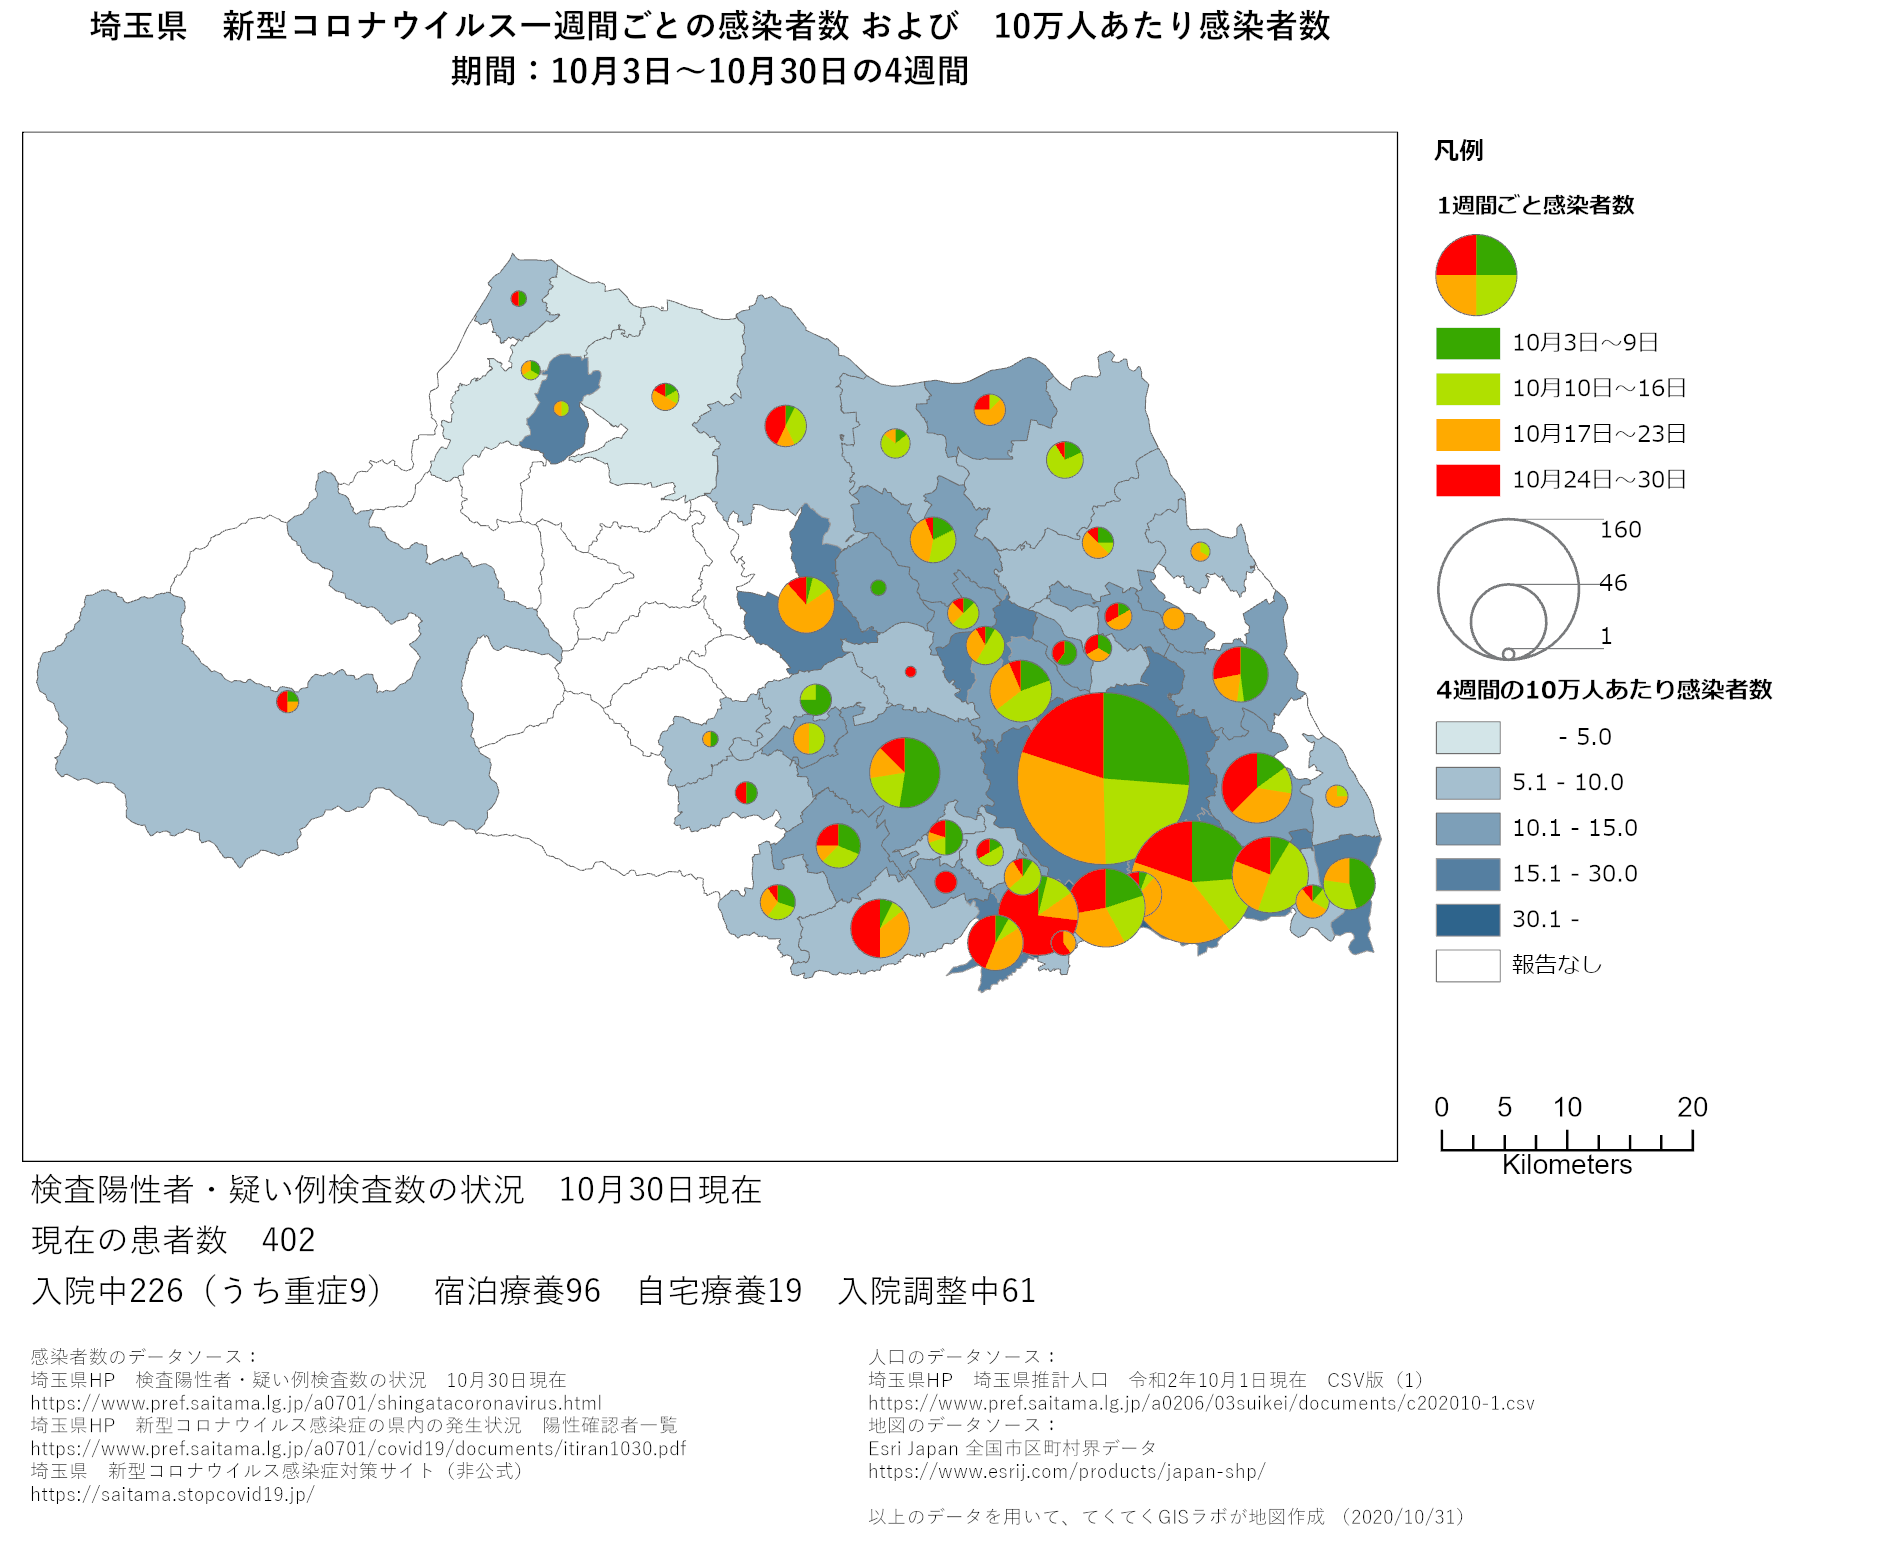 1週間ごと感染者数、埼玉県、10月3日〜10月30日